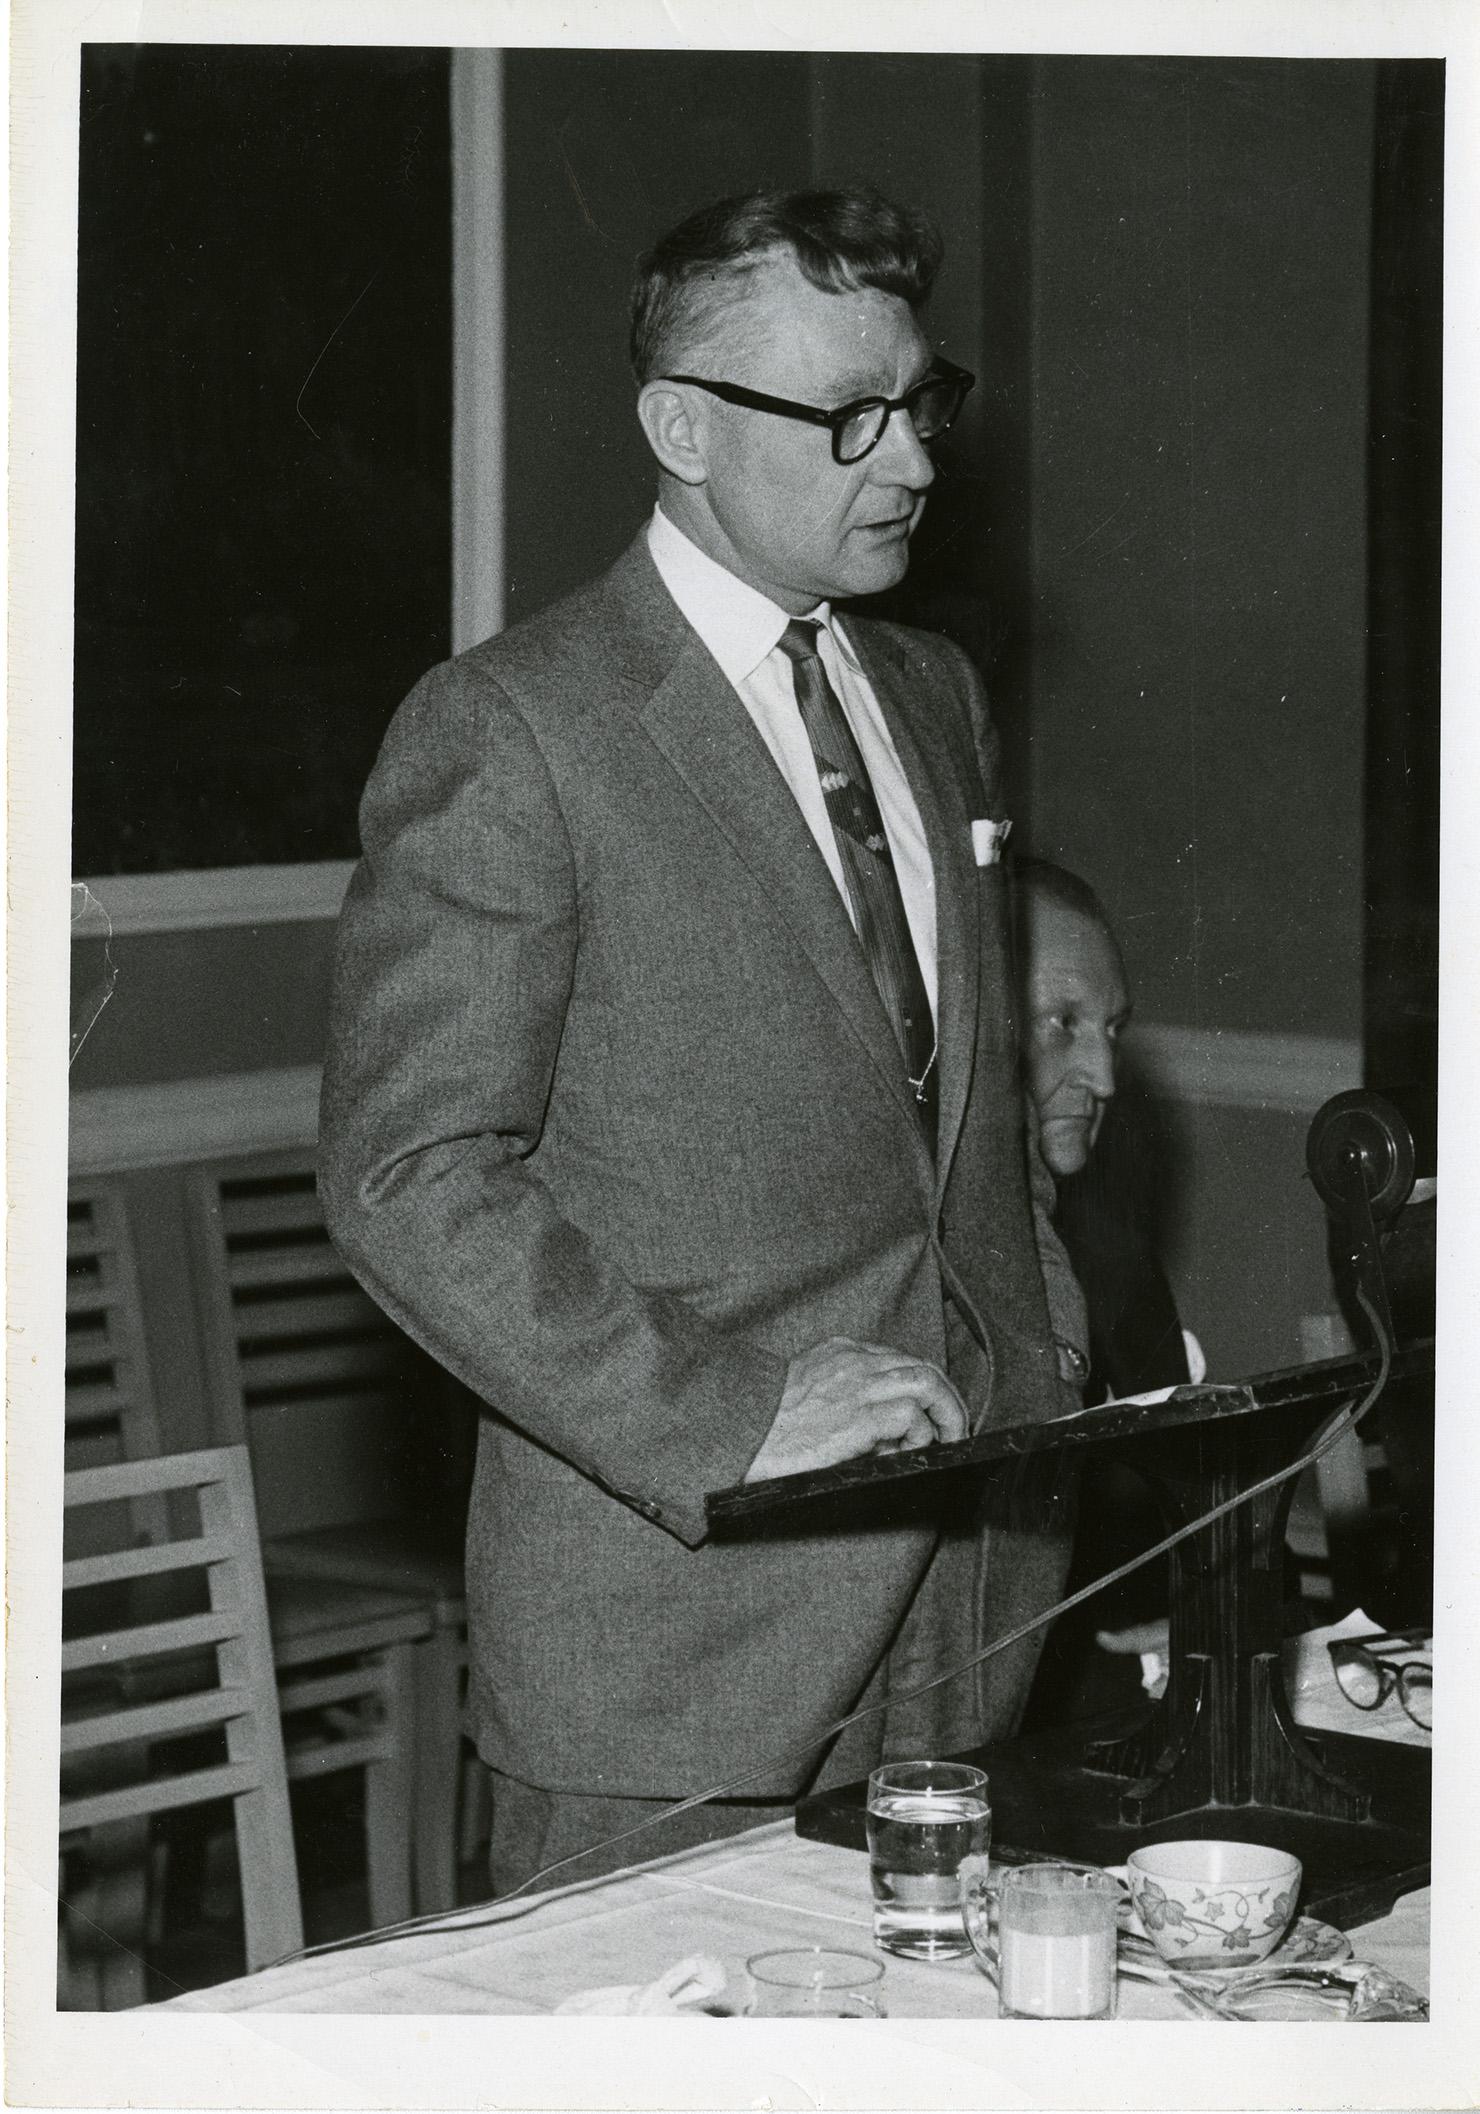 Merlin D. Bishop, 1950s